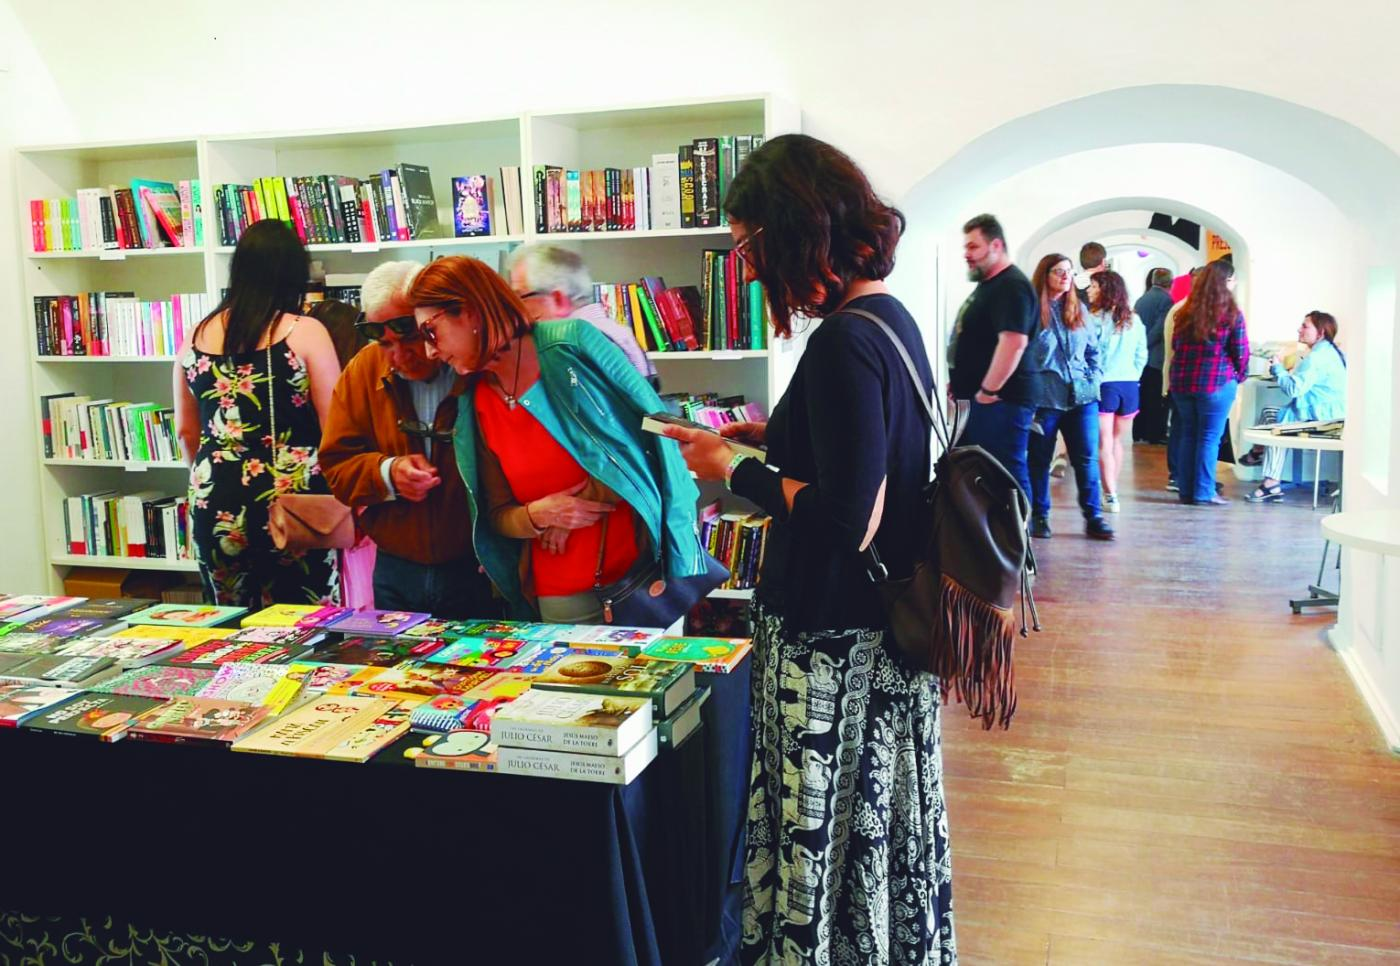 Nuevo certamen literario con motivo de la 36 Feria del Libro Cádiz 2021